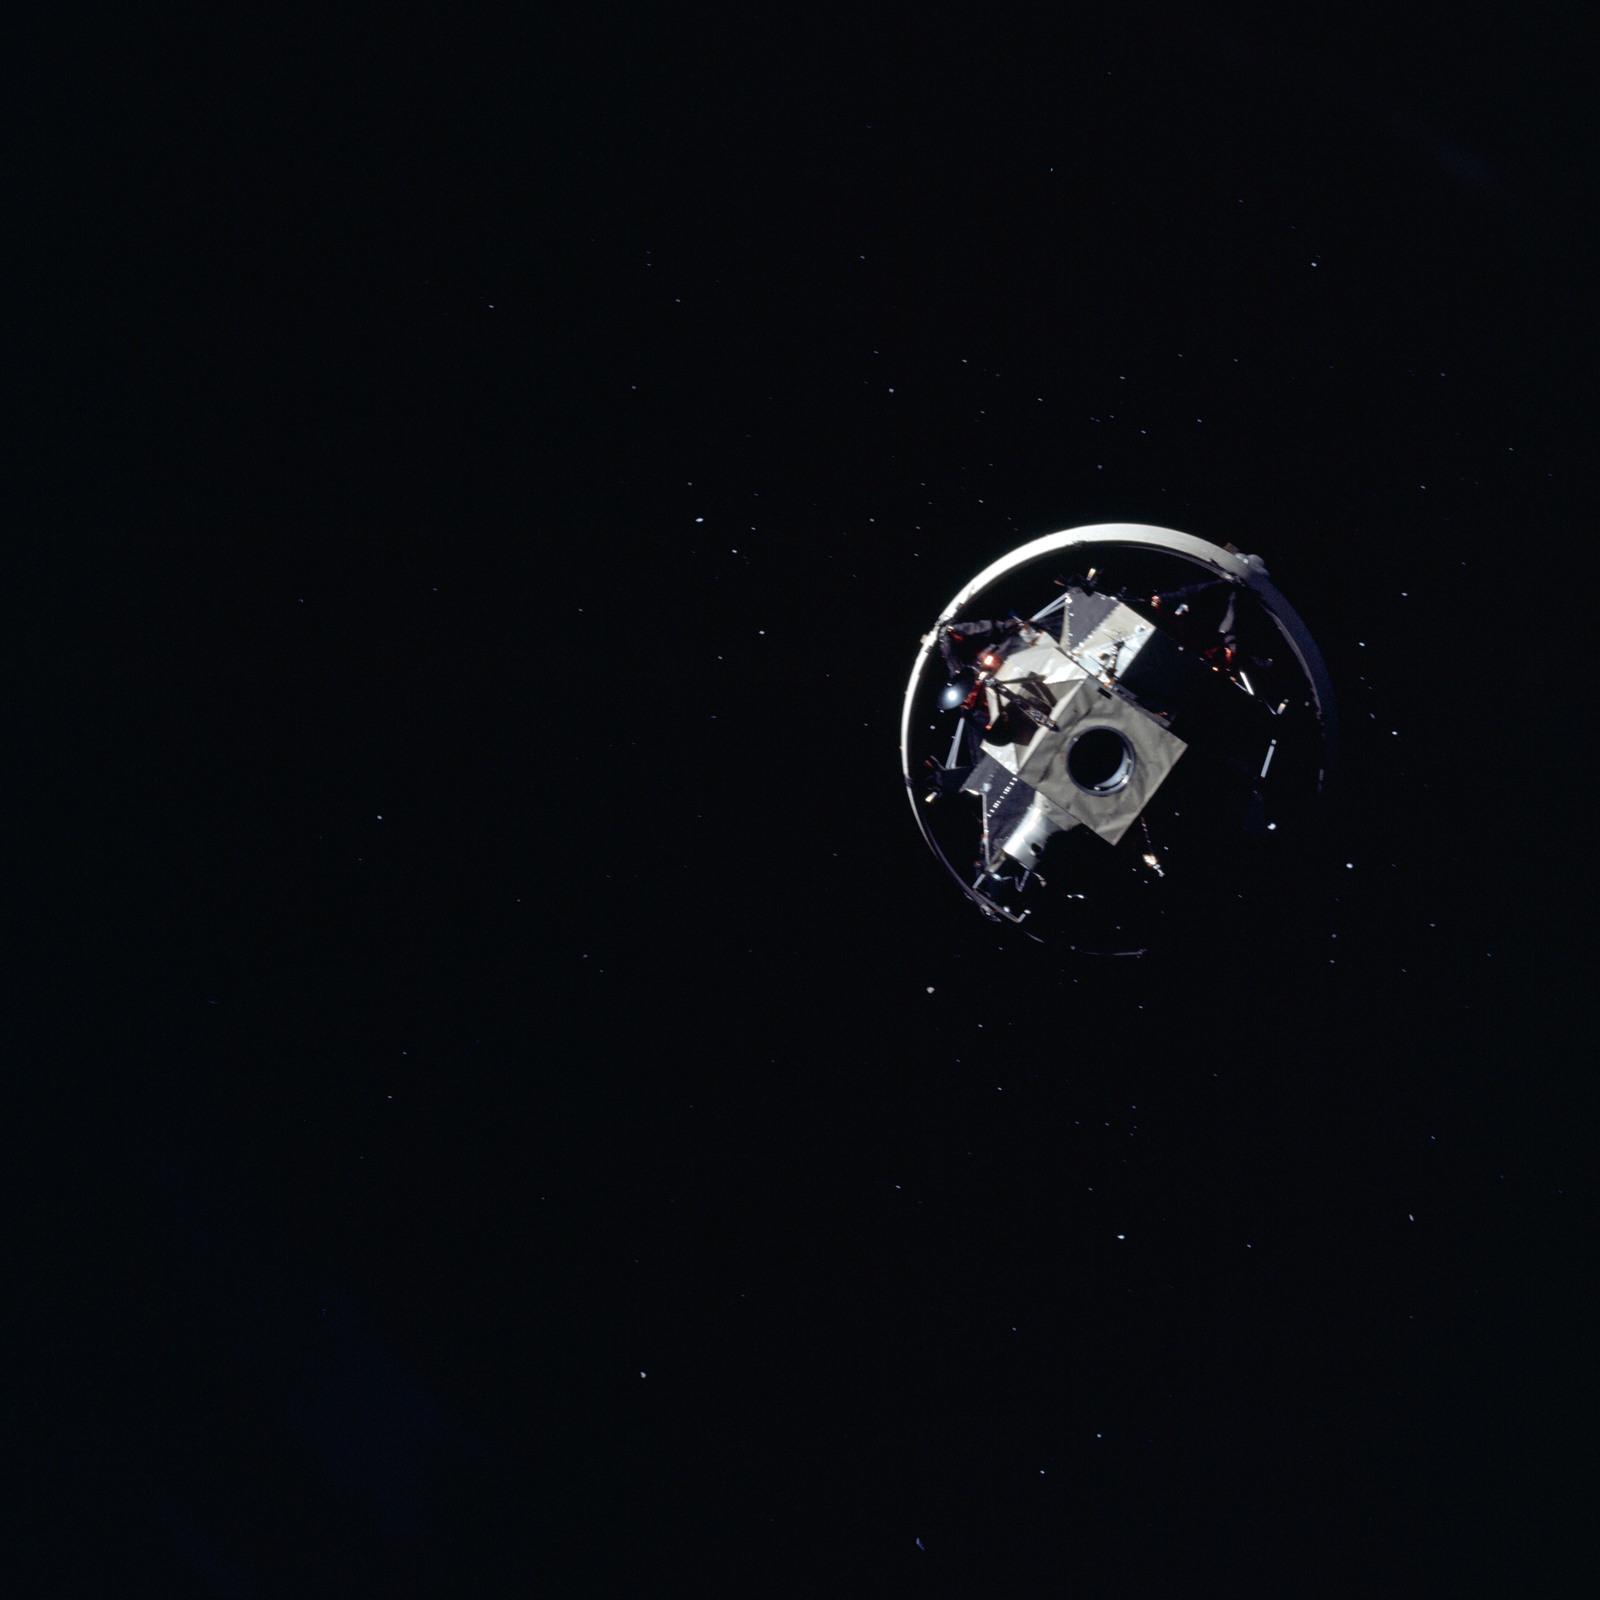 AS12-50-7328 - Apollo 12 - Apollo 12 Mission image  - Parts of United States and Central America.